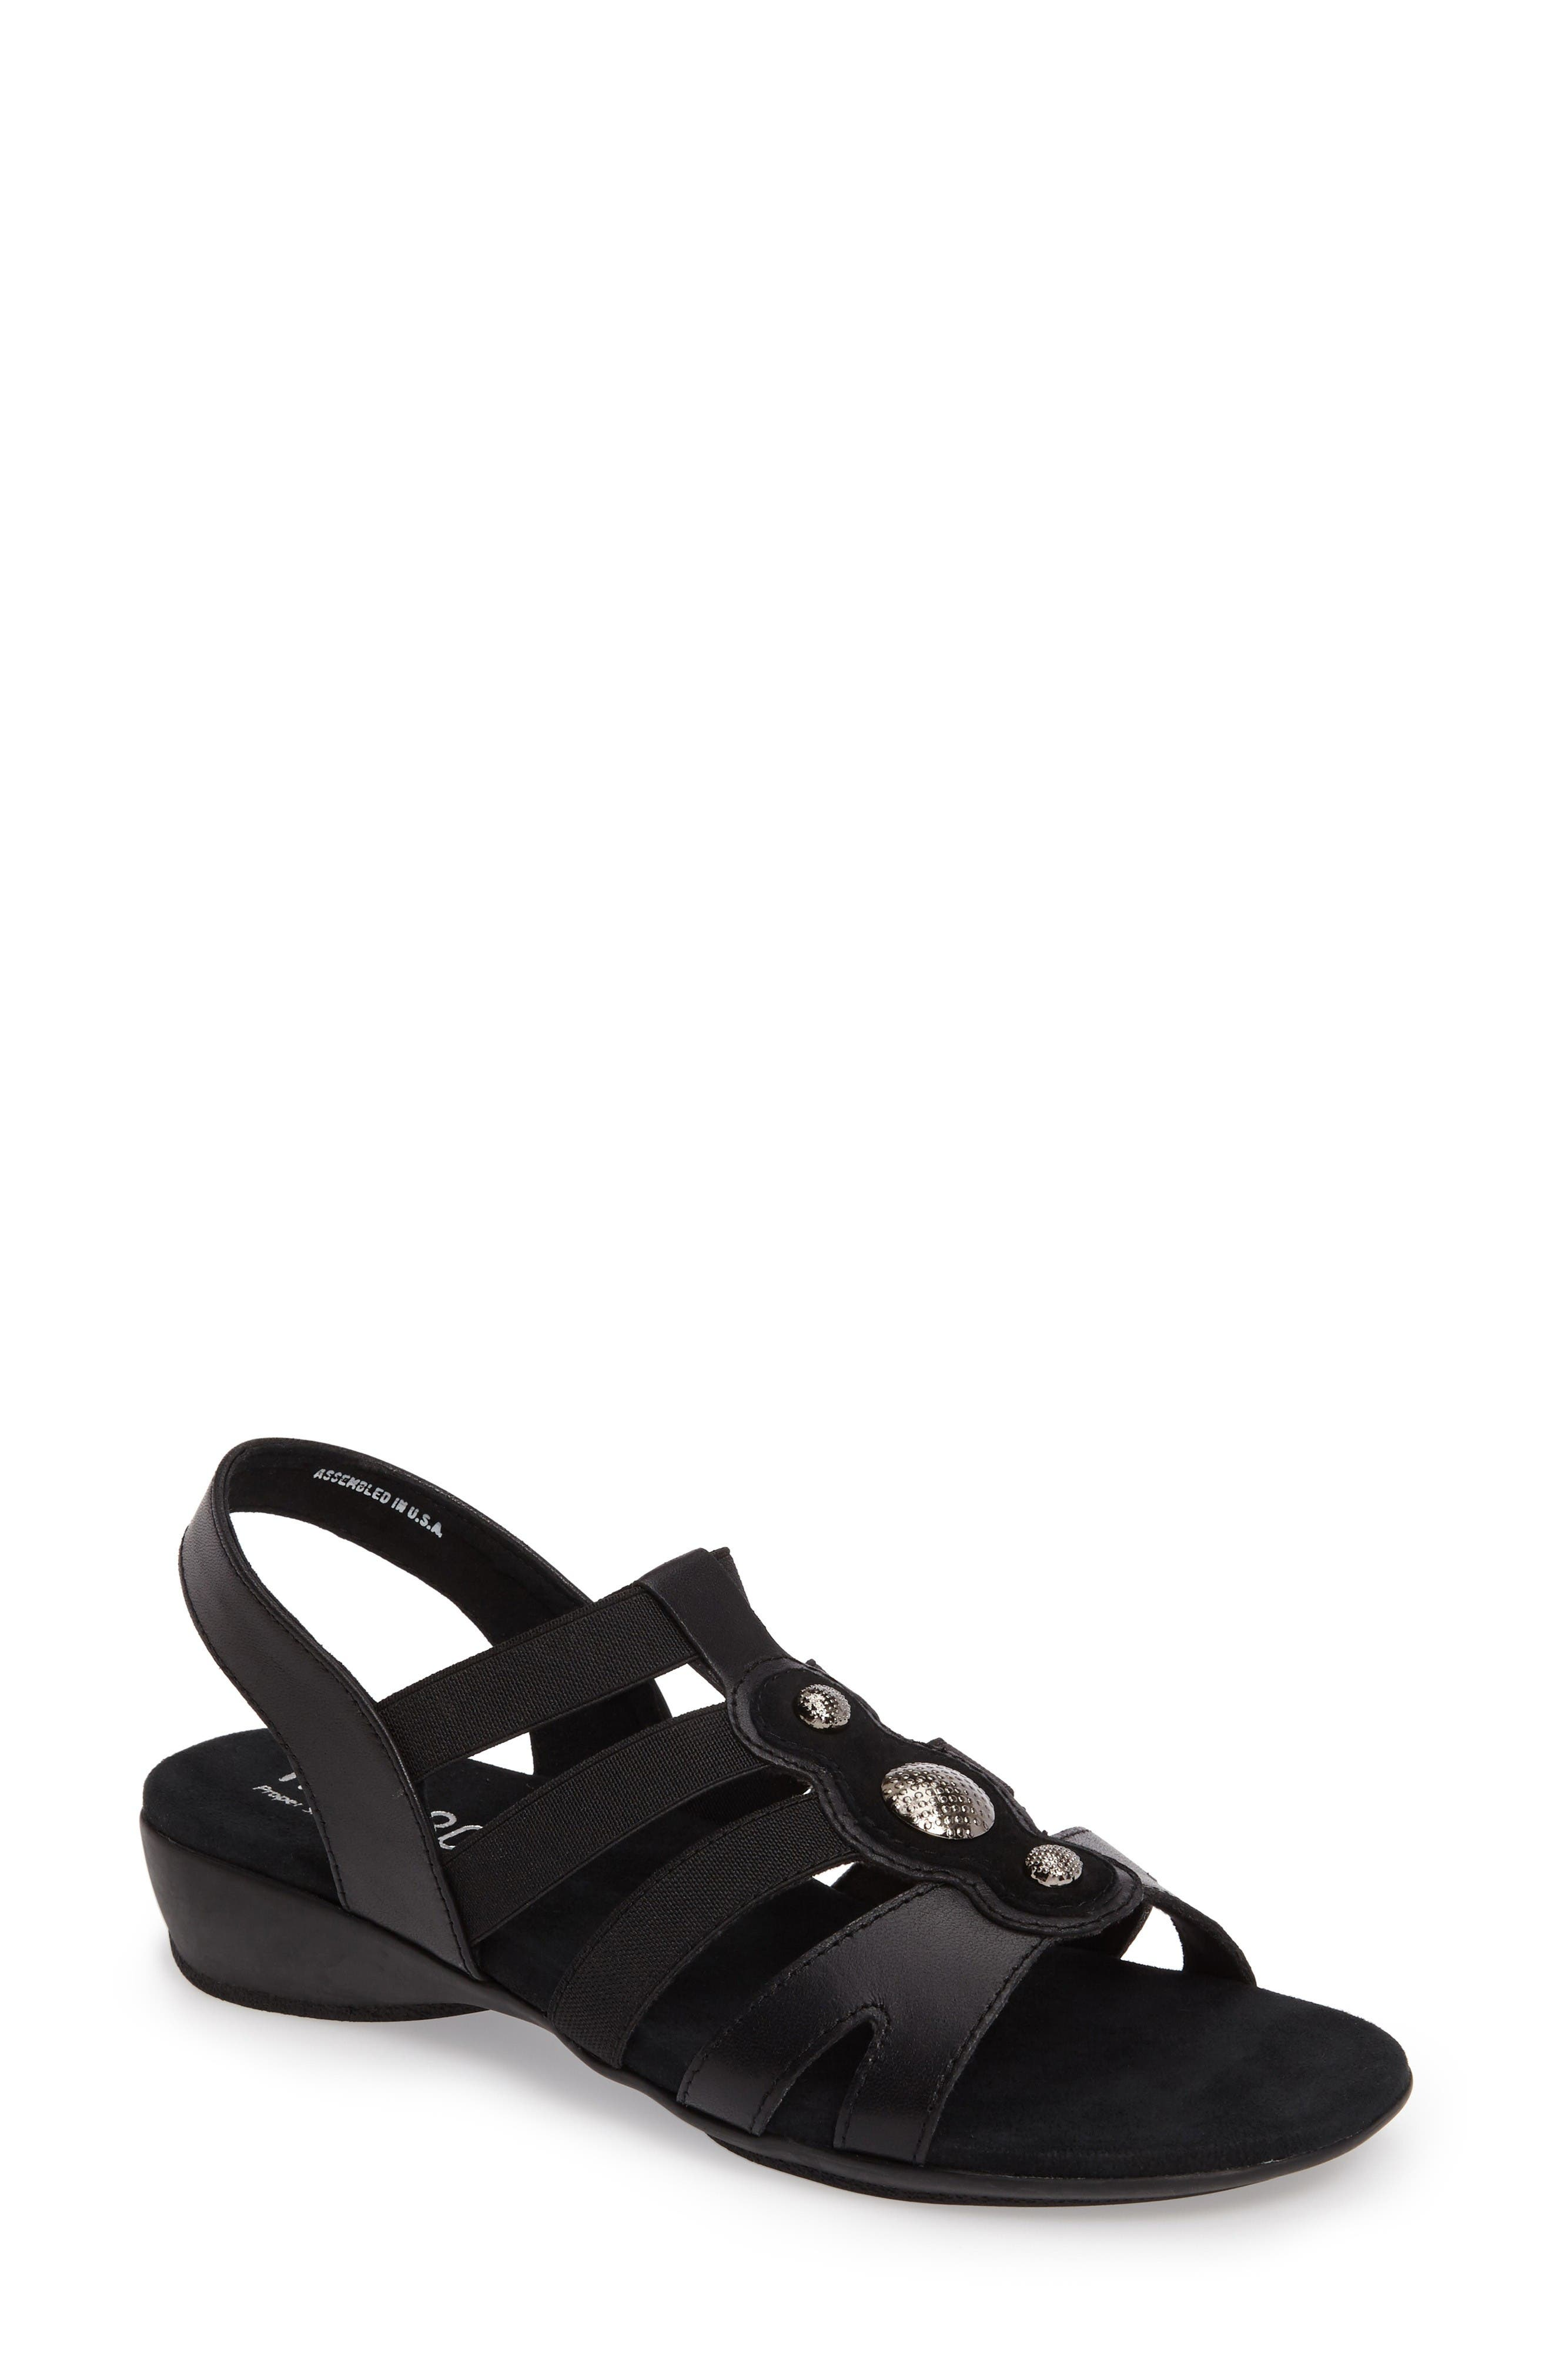 Destiny Sandal,                             Main thumbnail 1, color,                             Black Leather